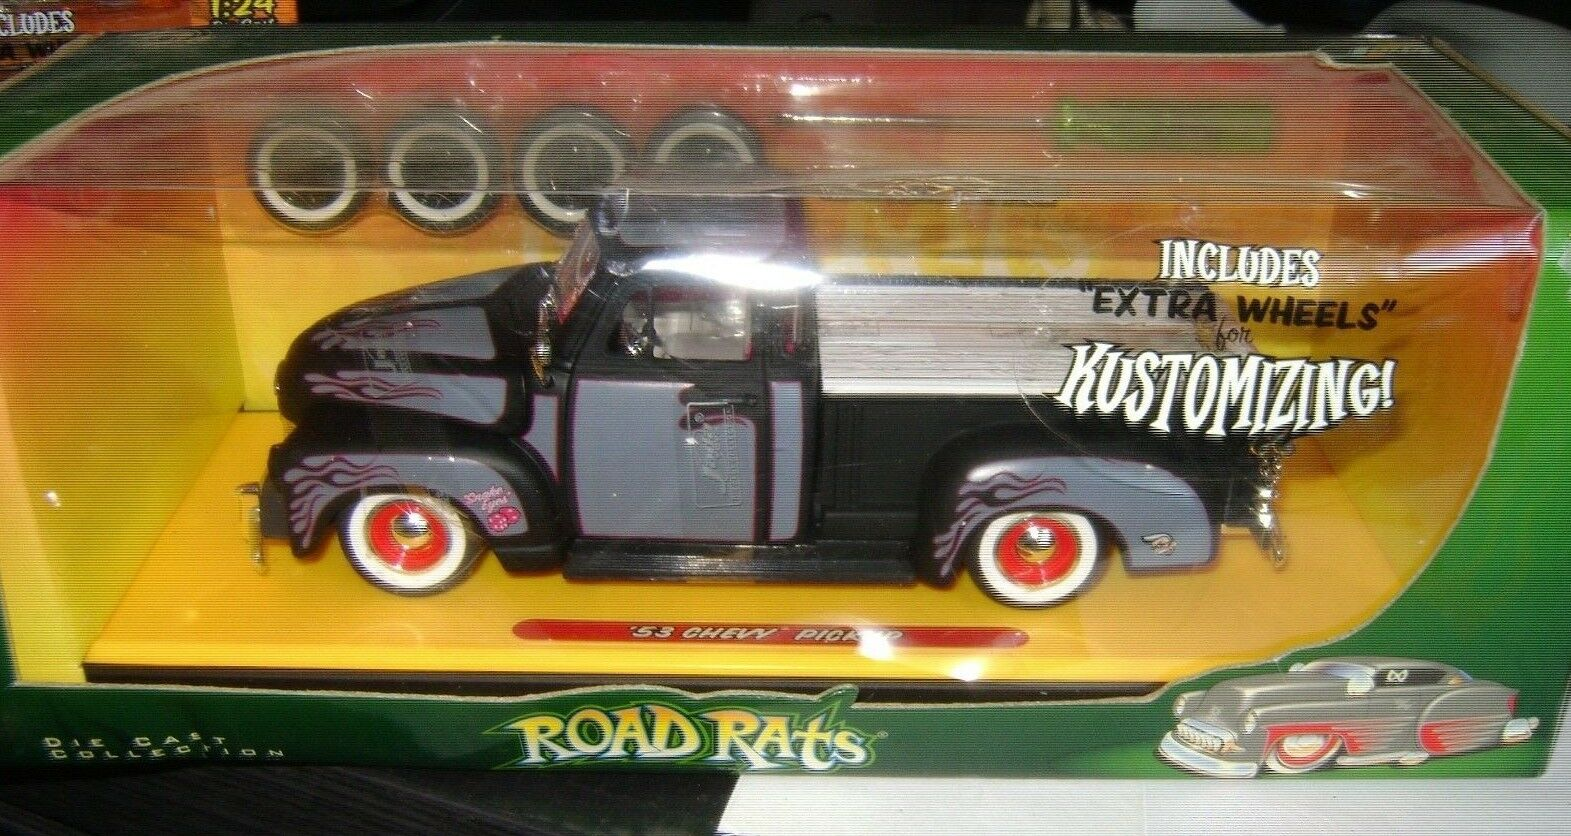 Road ratas Jada Juguetes 1953'53 DIE-CAST Chevy Camioneta 1 24 Con Ruedas Extra